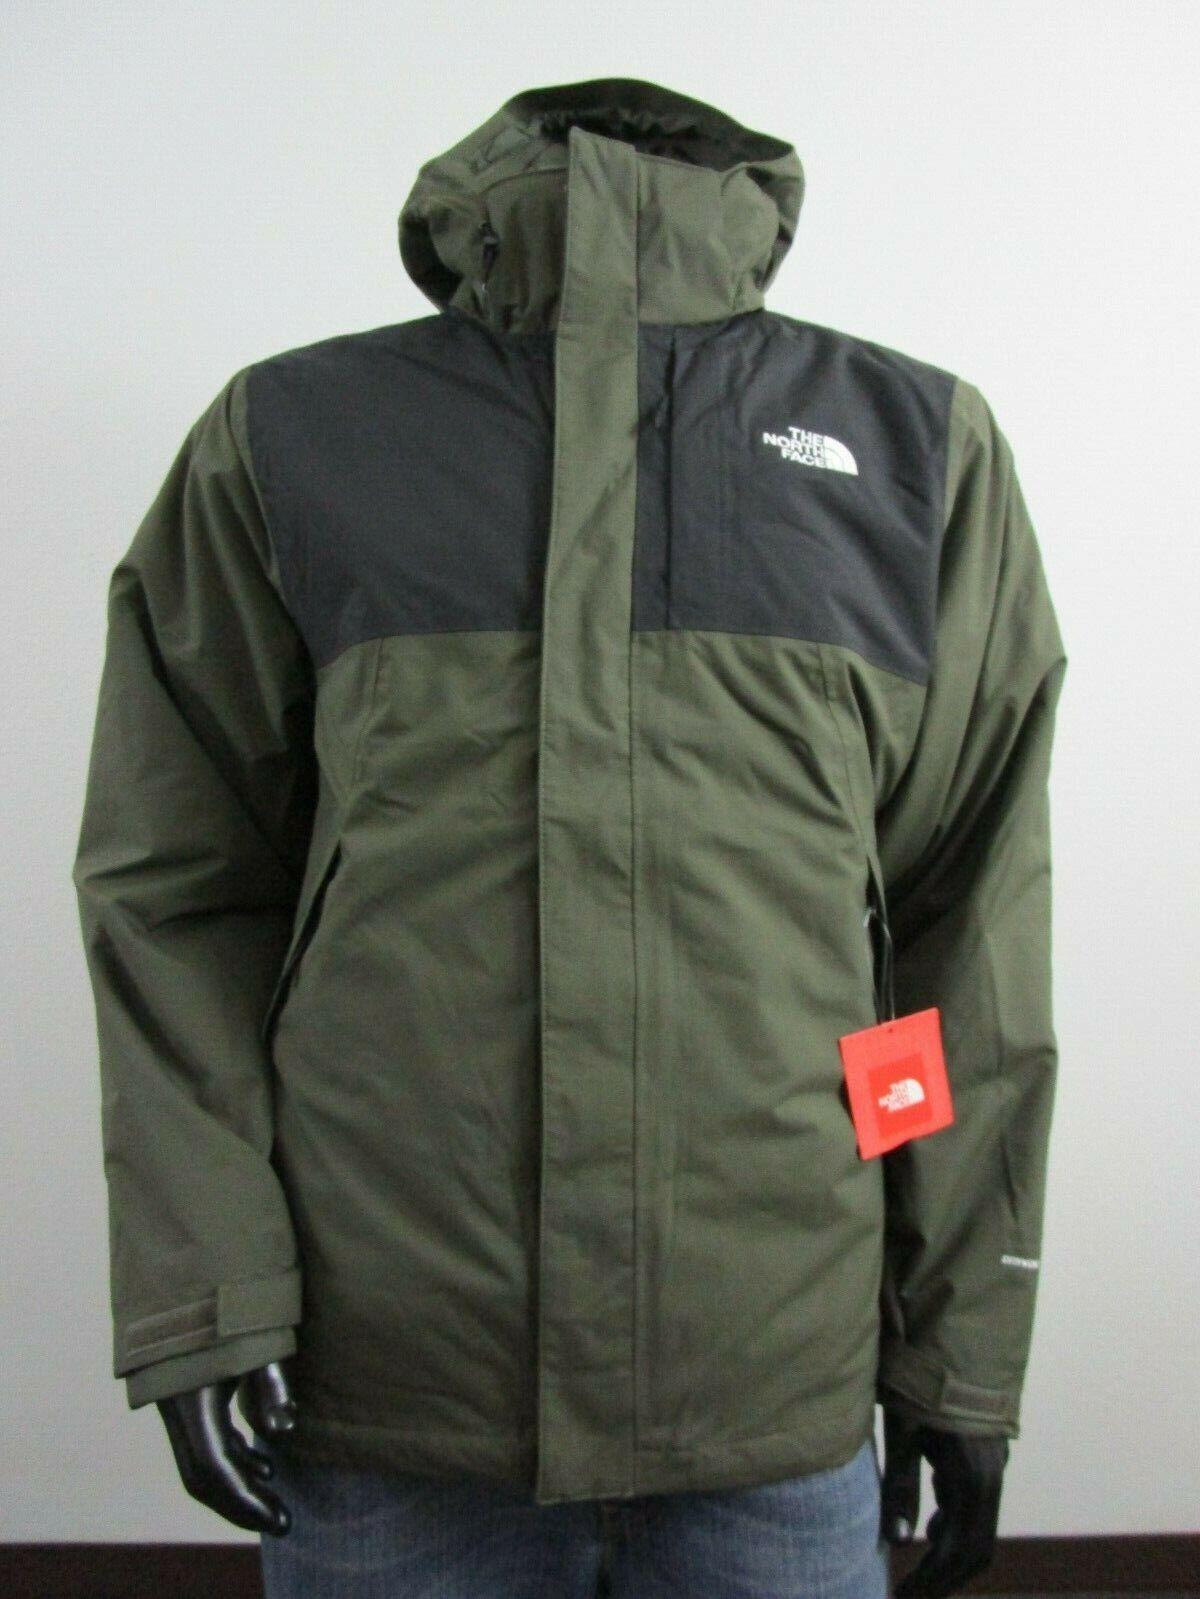 NWT Mens TNF The North Face Lonepeak Tri 3 in 1 Hooded Waterproof Jacket Black